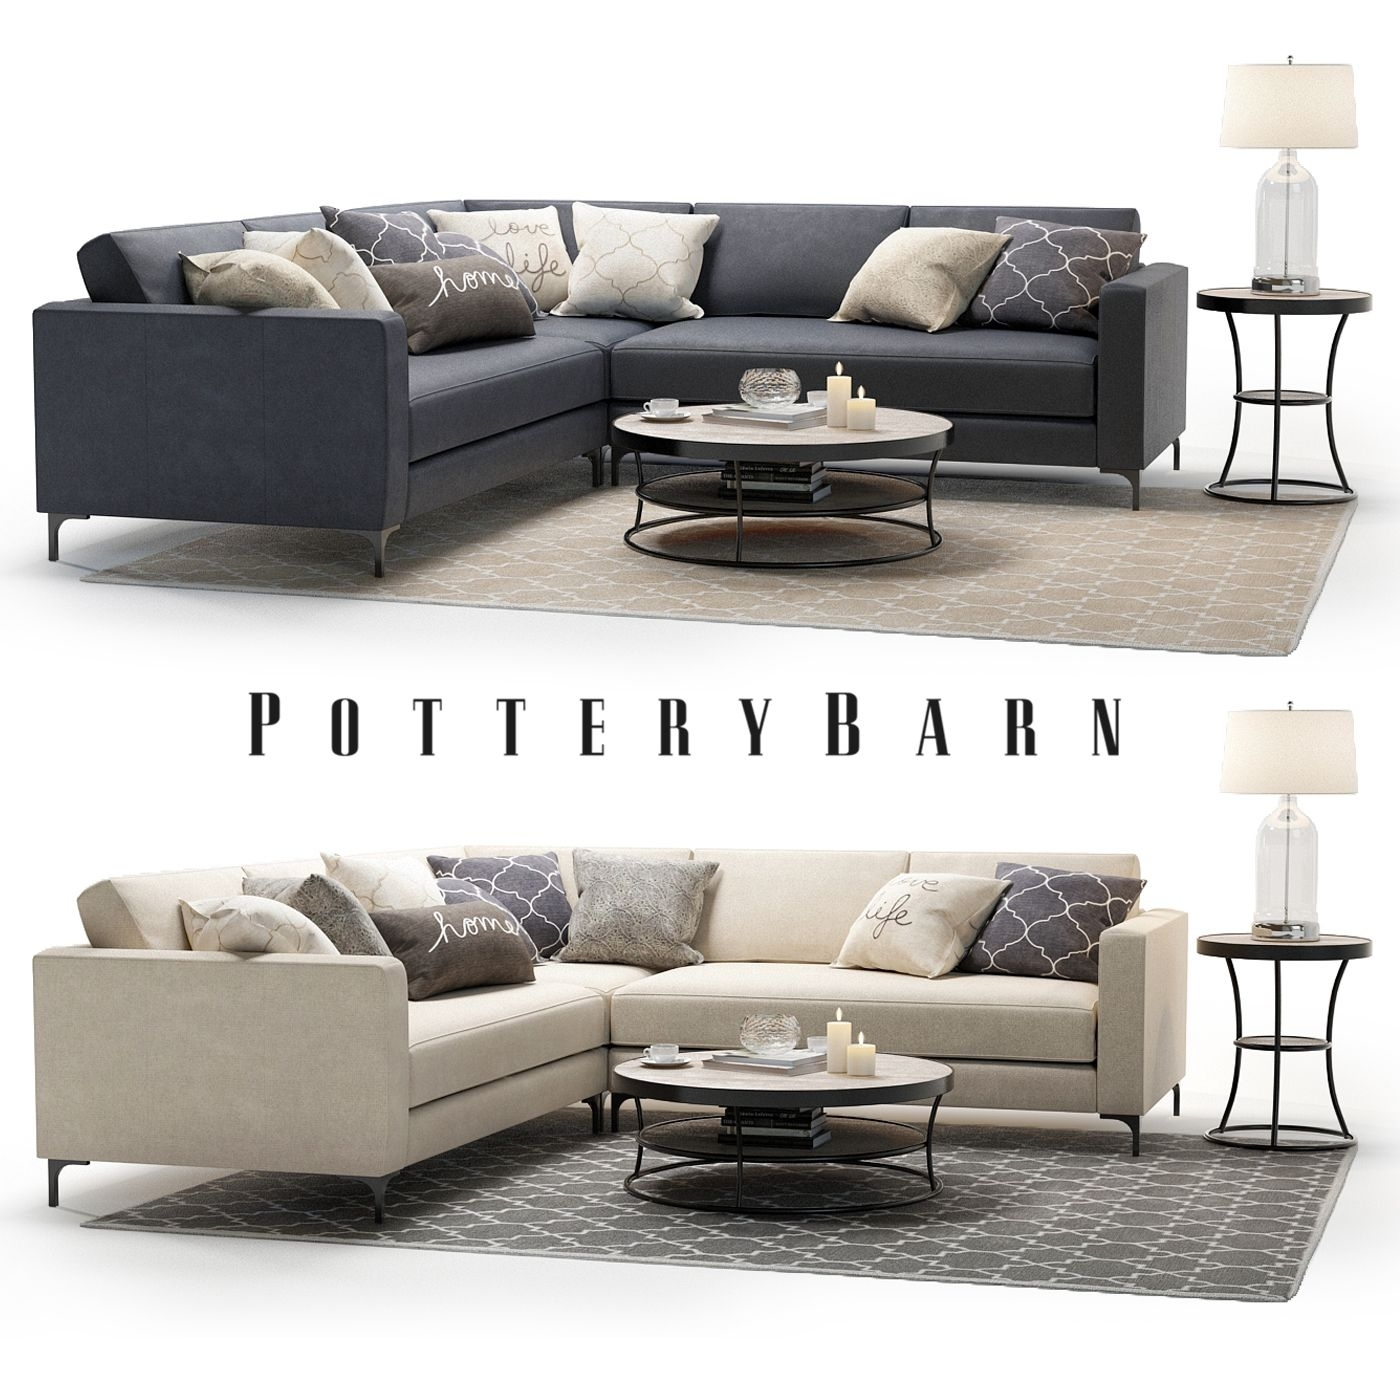 3D Model U2013 Pottery Barn U2013 Jake Sectional Sofa With Bartlett With Pottery  Barn Sectional Sofas